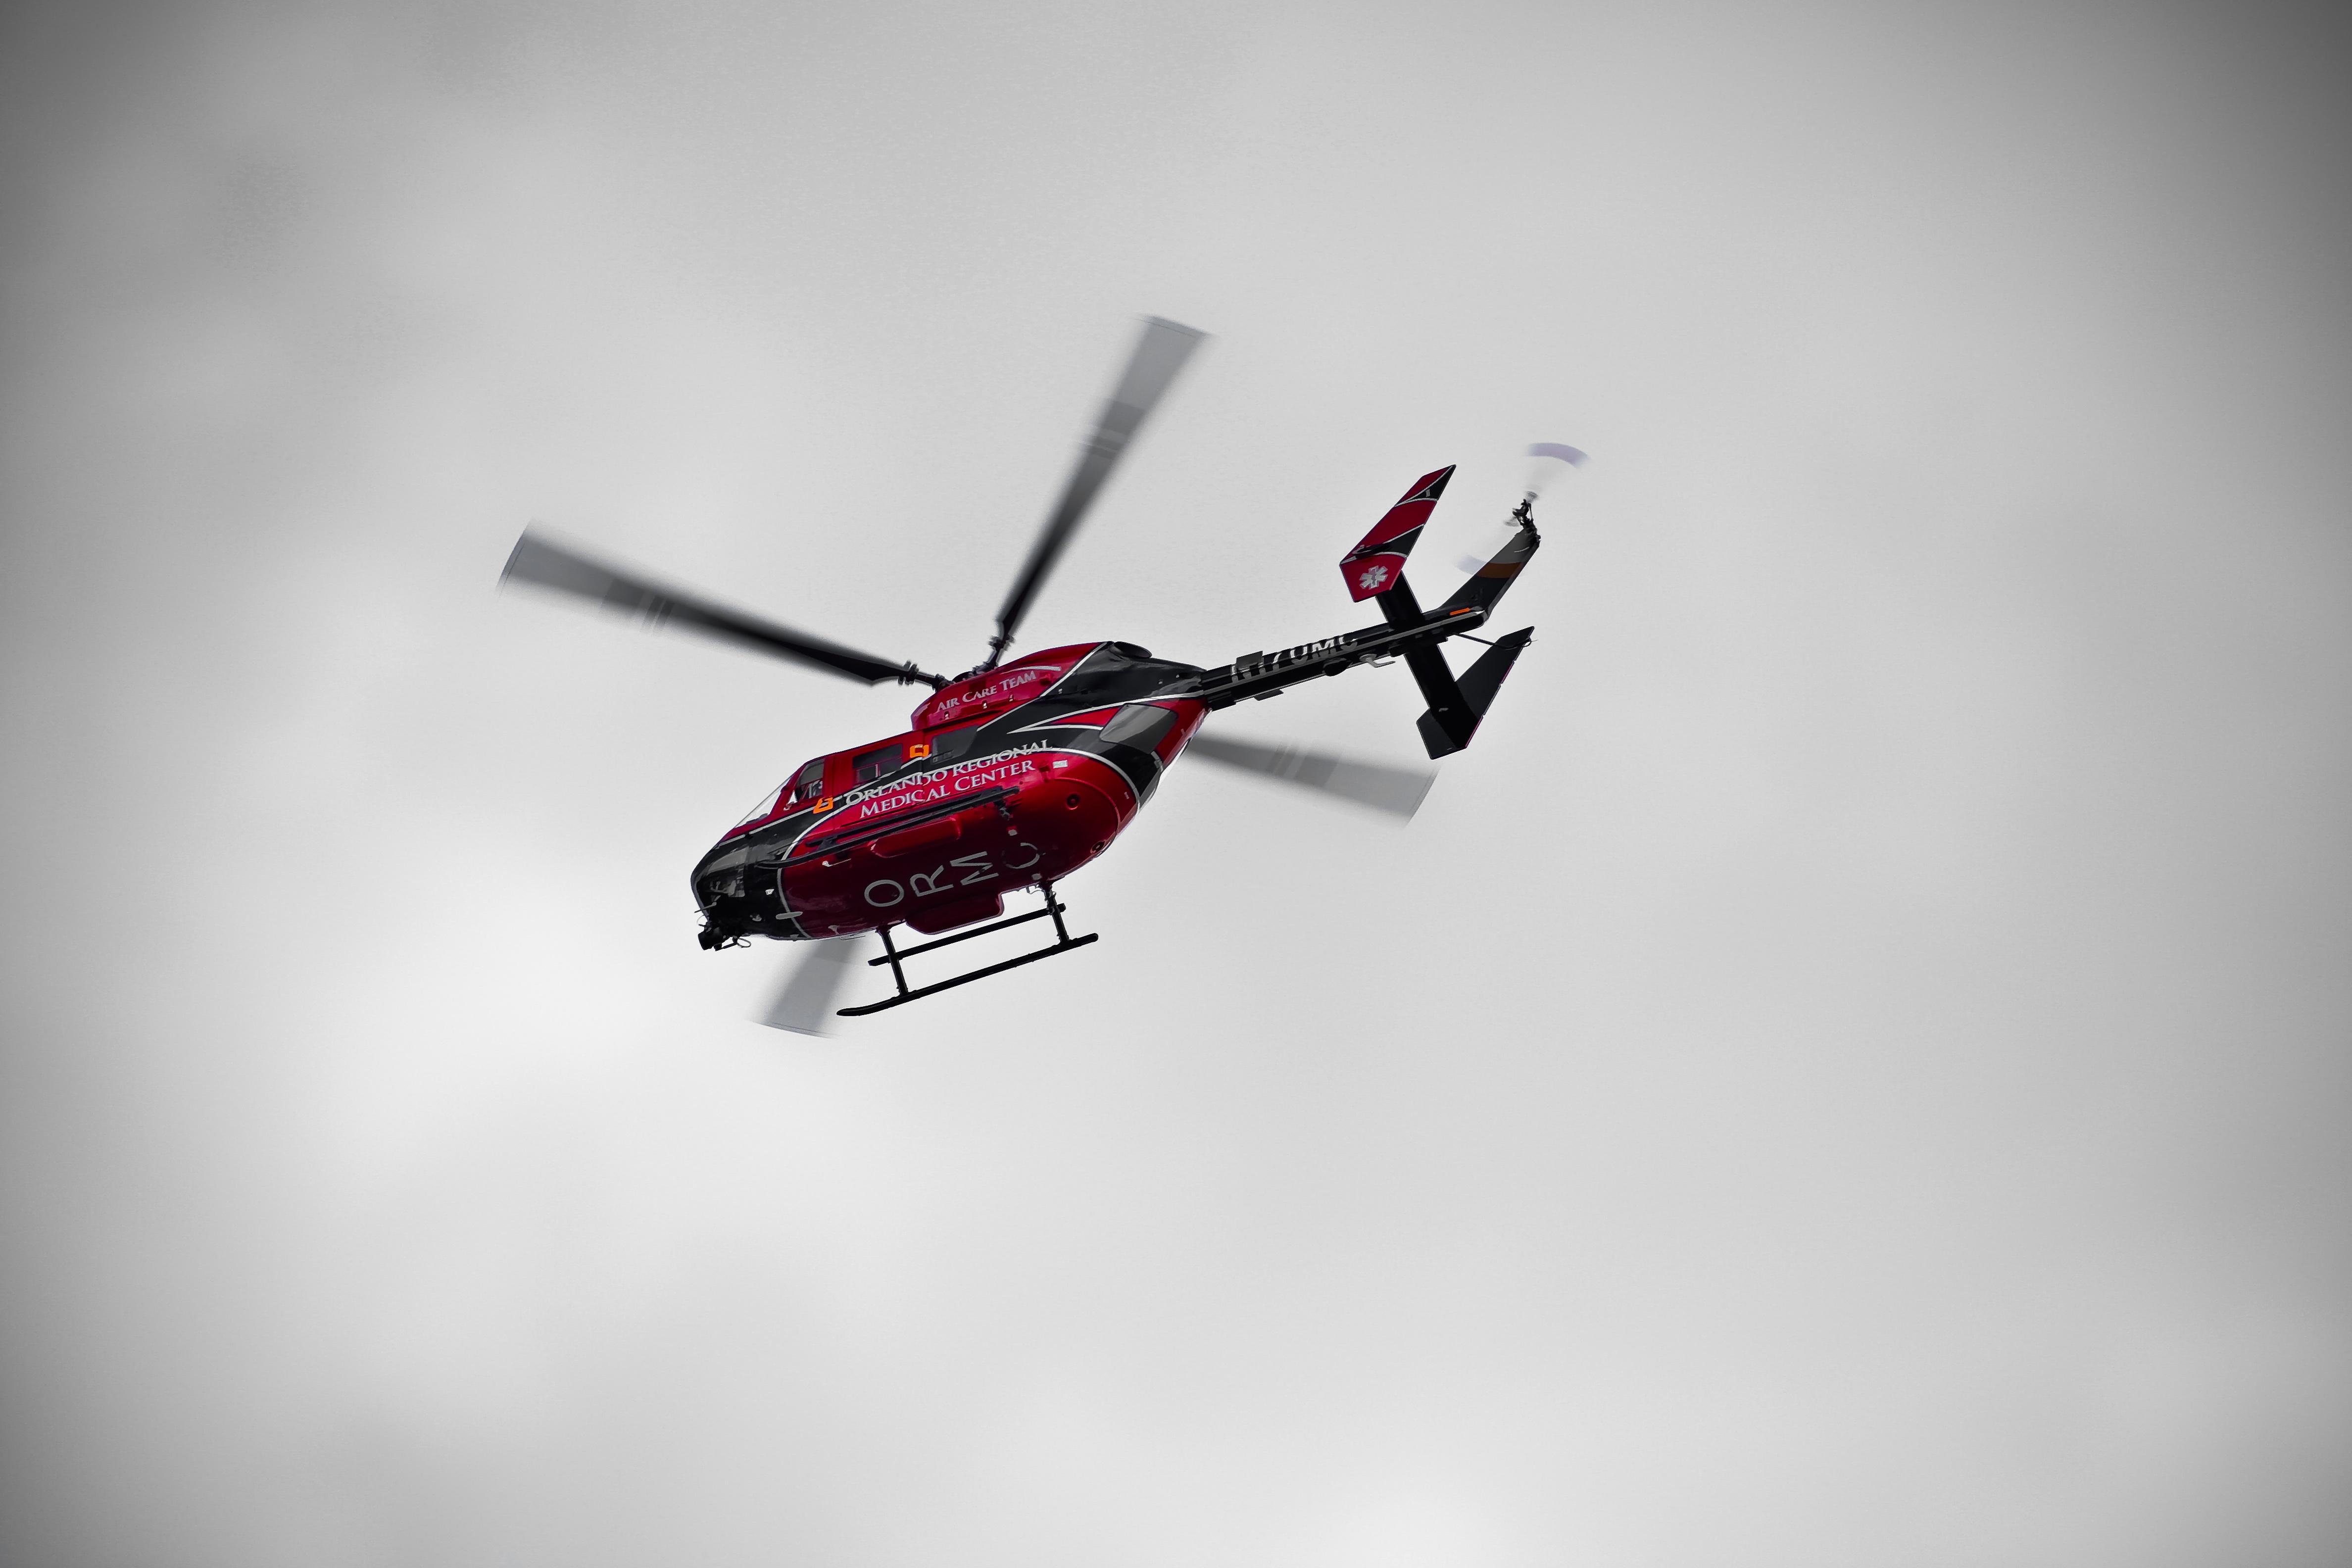 Orlando Regional Medical Center helicopter